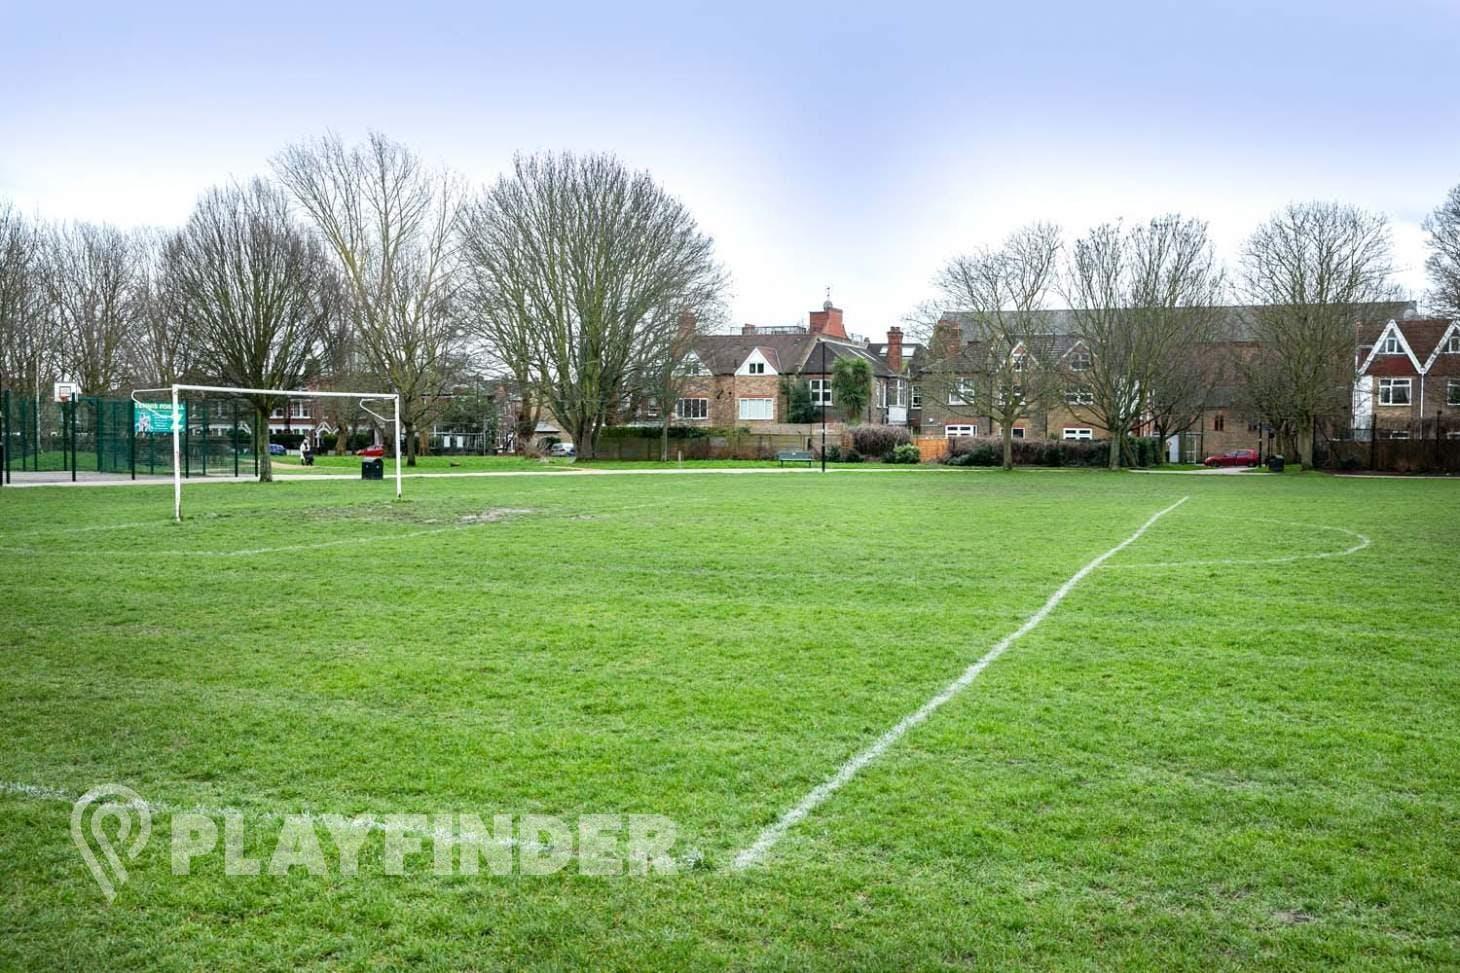 Southfield Road Playing Fields 9 a side   Grass football pitch